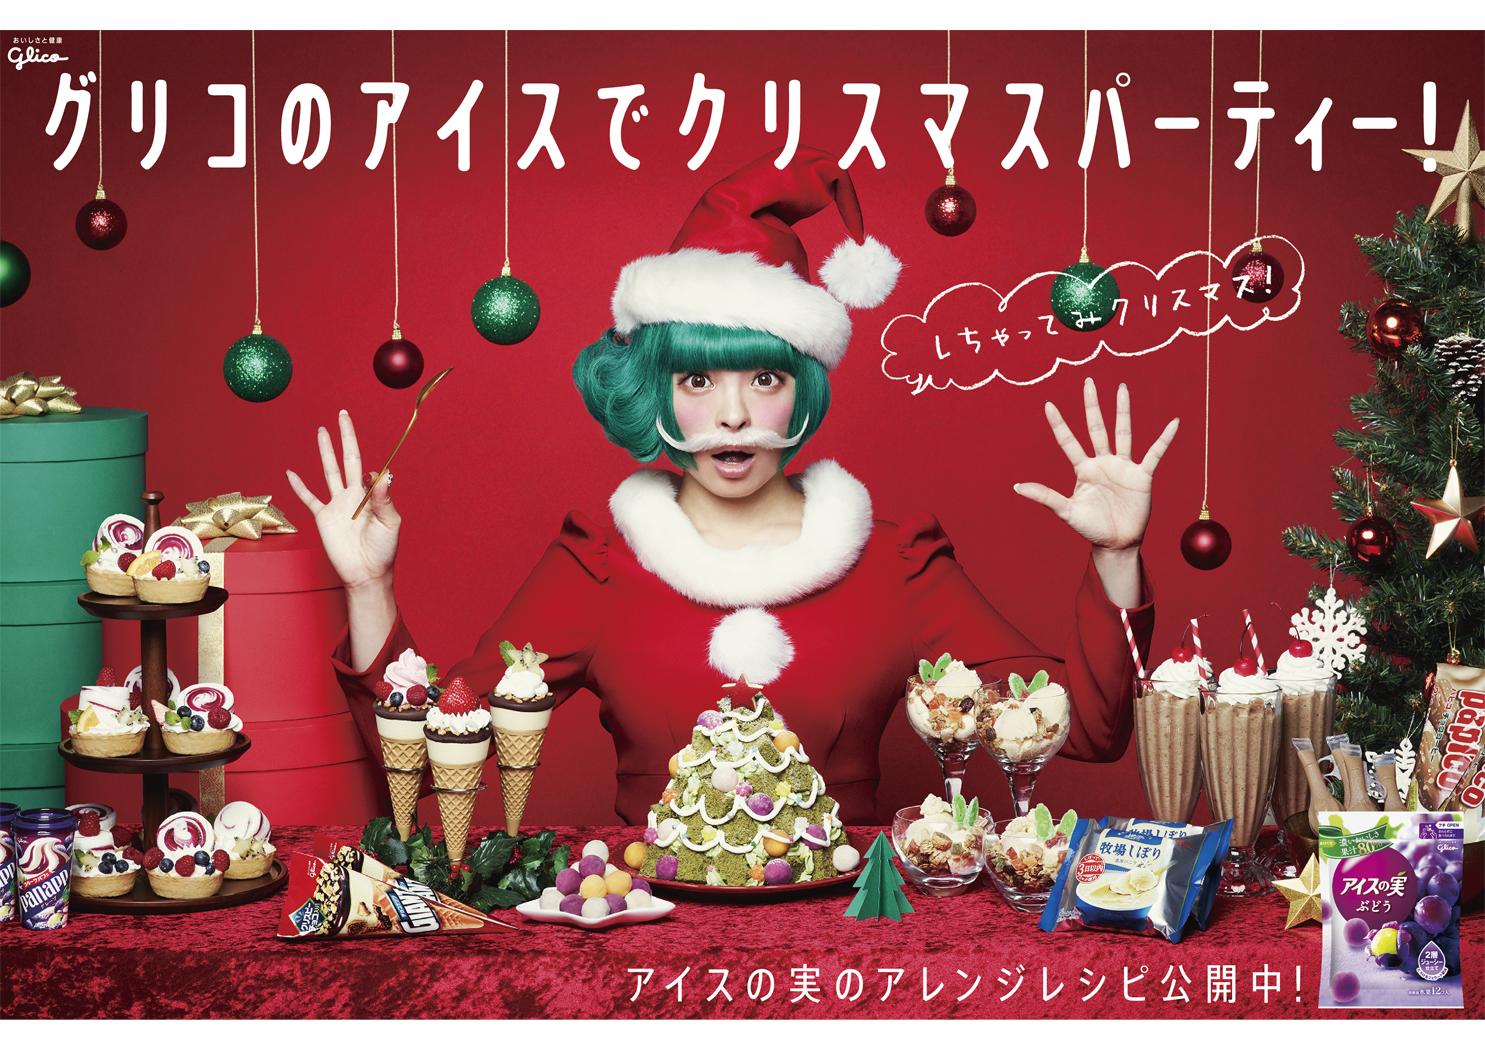 glico icenomi Christmas 2016